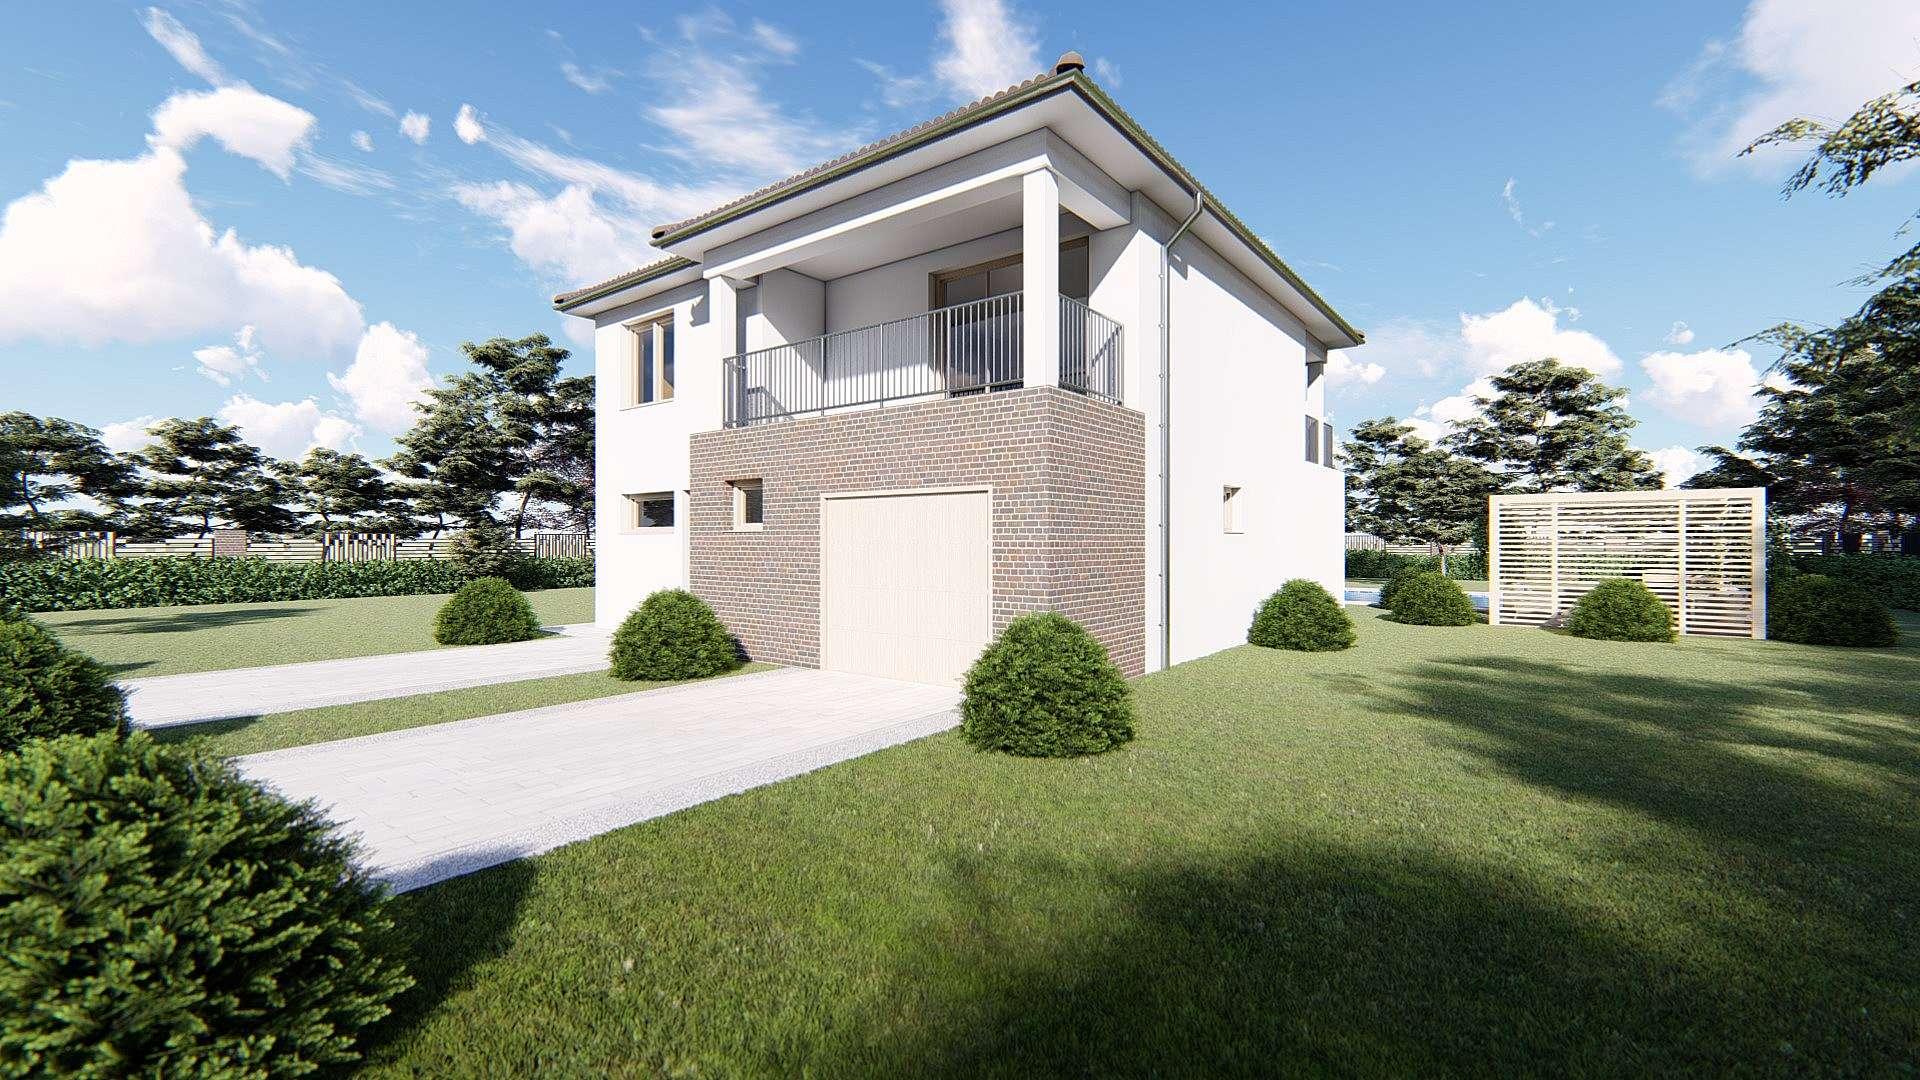 Projekt domu KIARA 4